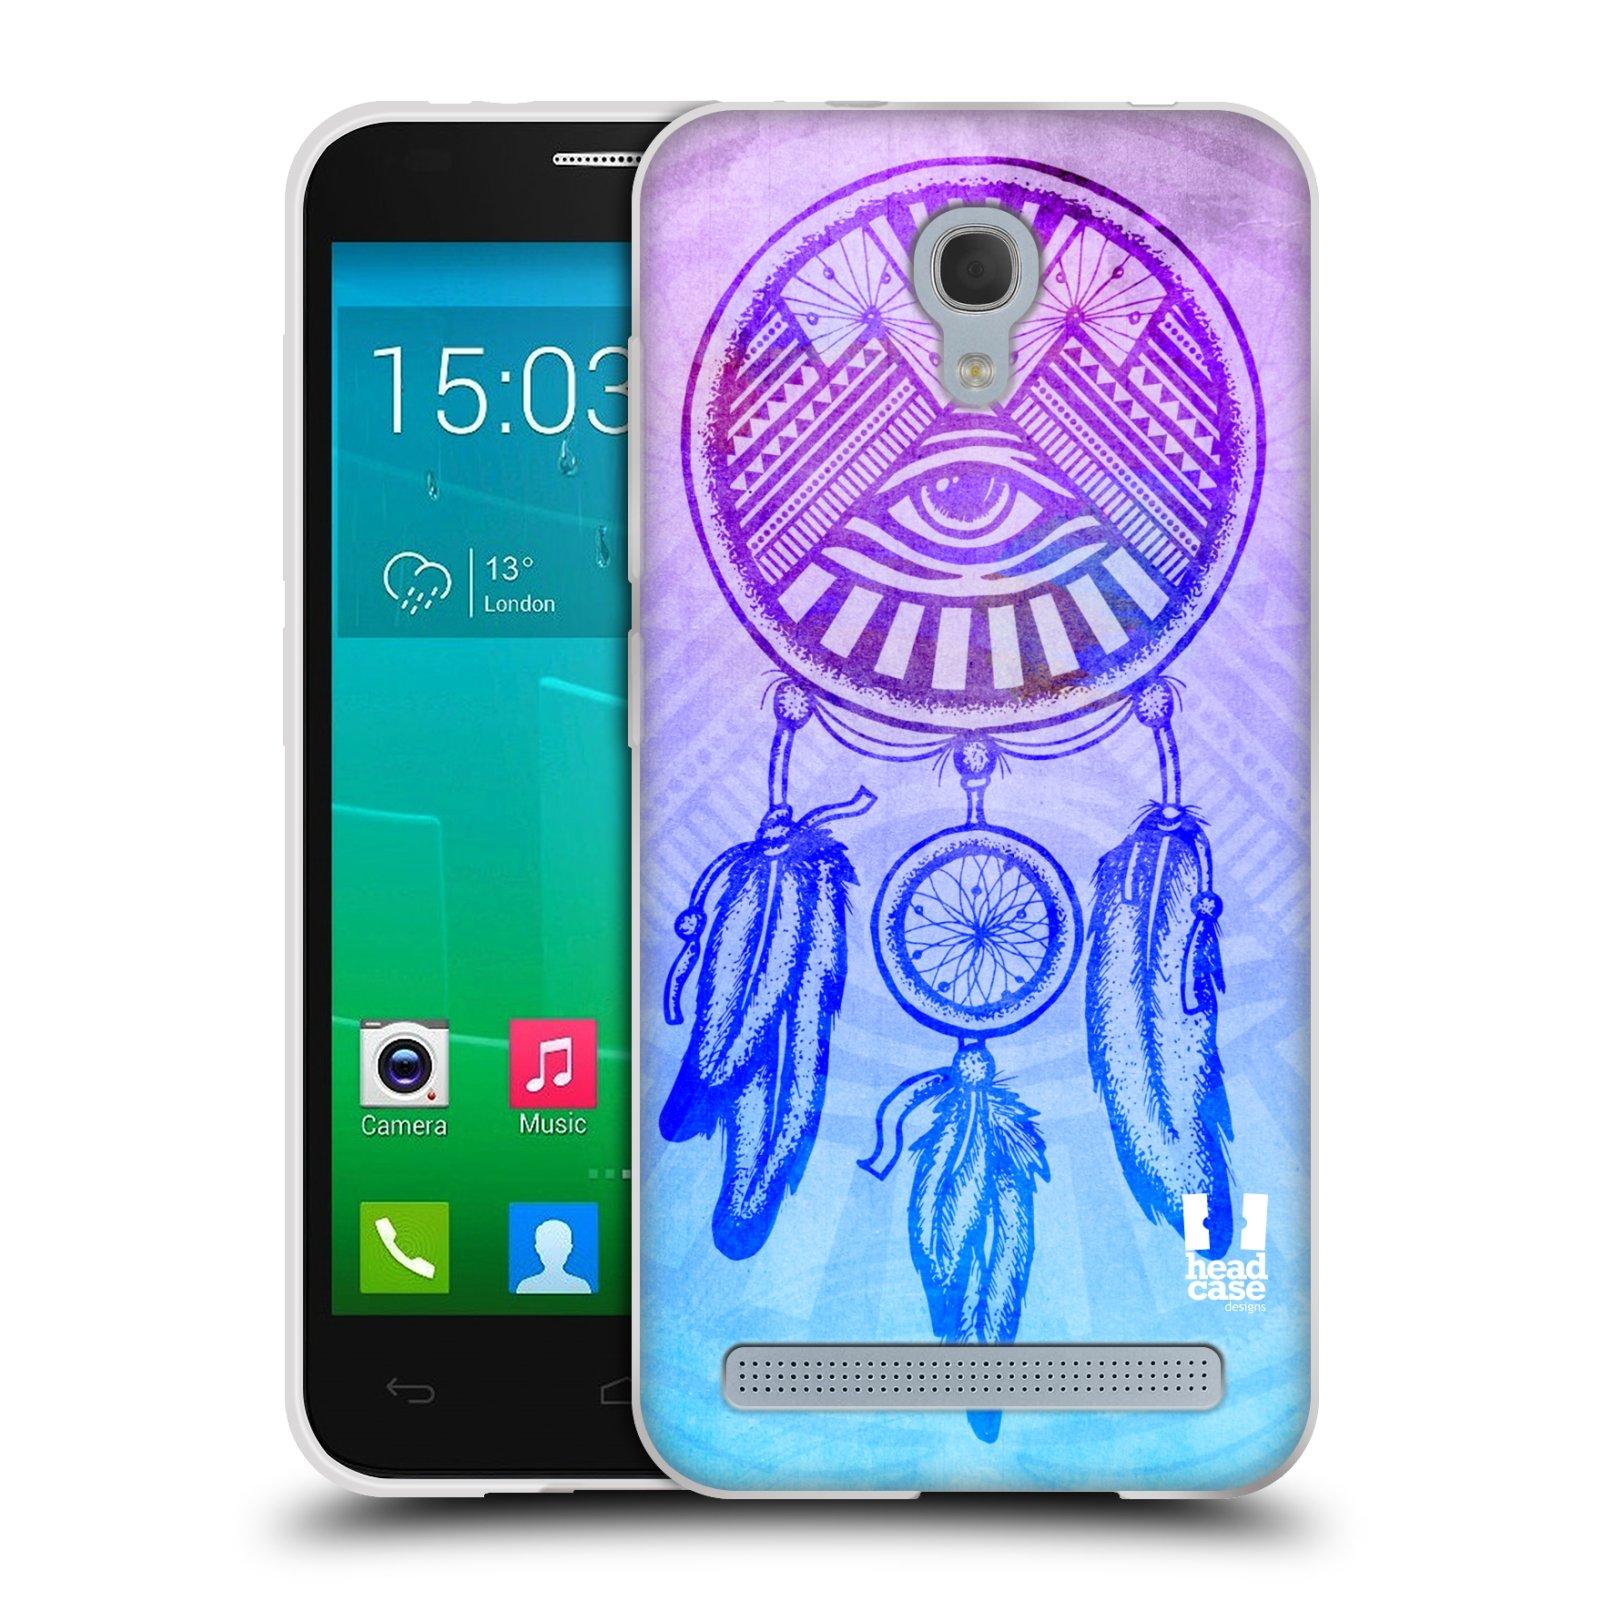 Silikonové pouzdro na mobil Alcatel One Touch Idol 2 Mini S 6036Y HEAD CASE Lapač s okem (Silikonový kryt či obal na mobilní telefon Alcatel Idol 2 Mini S OT-6036Y)